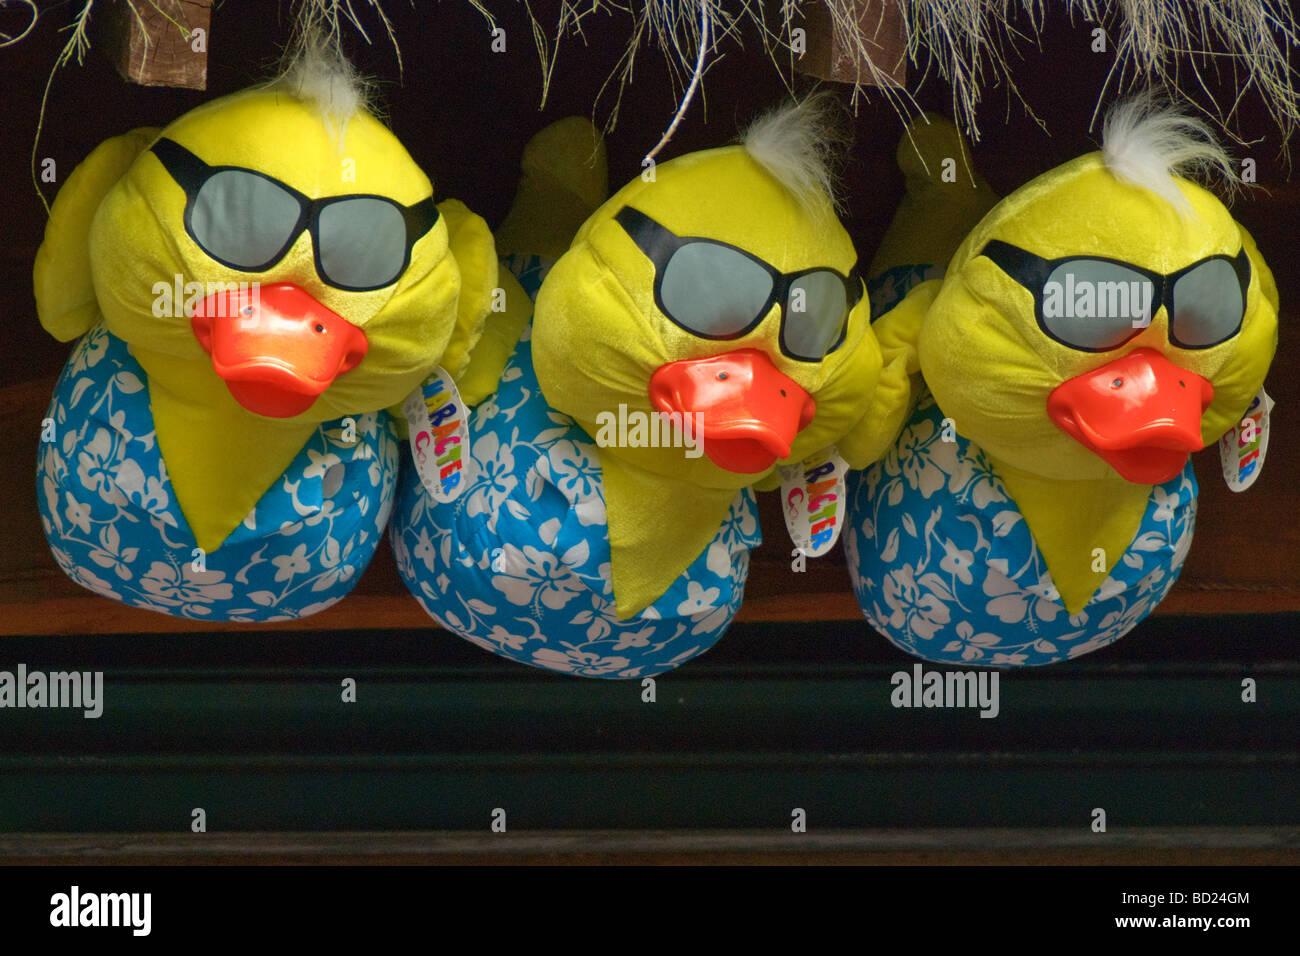 Three inflatable ducks. - Stock Image